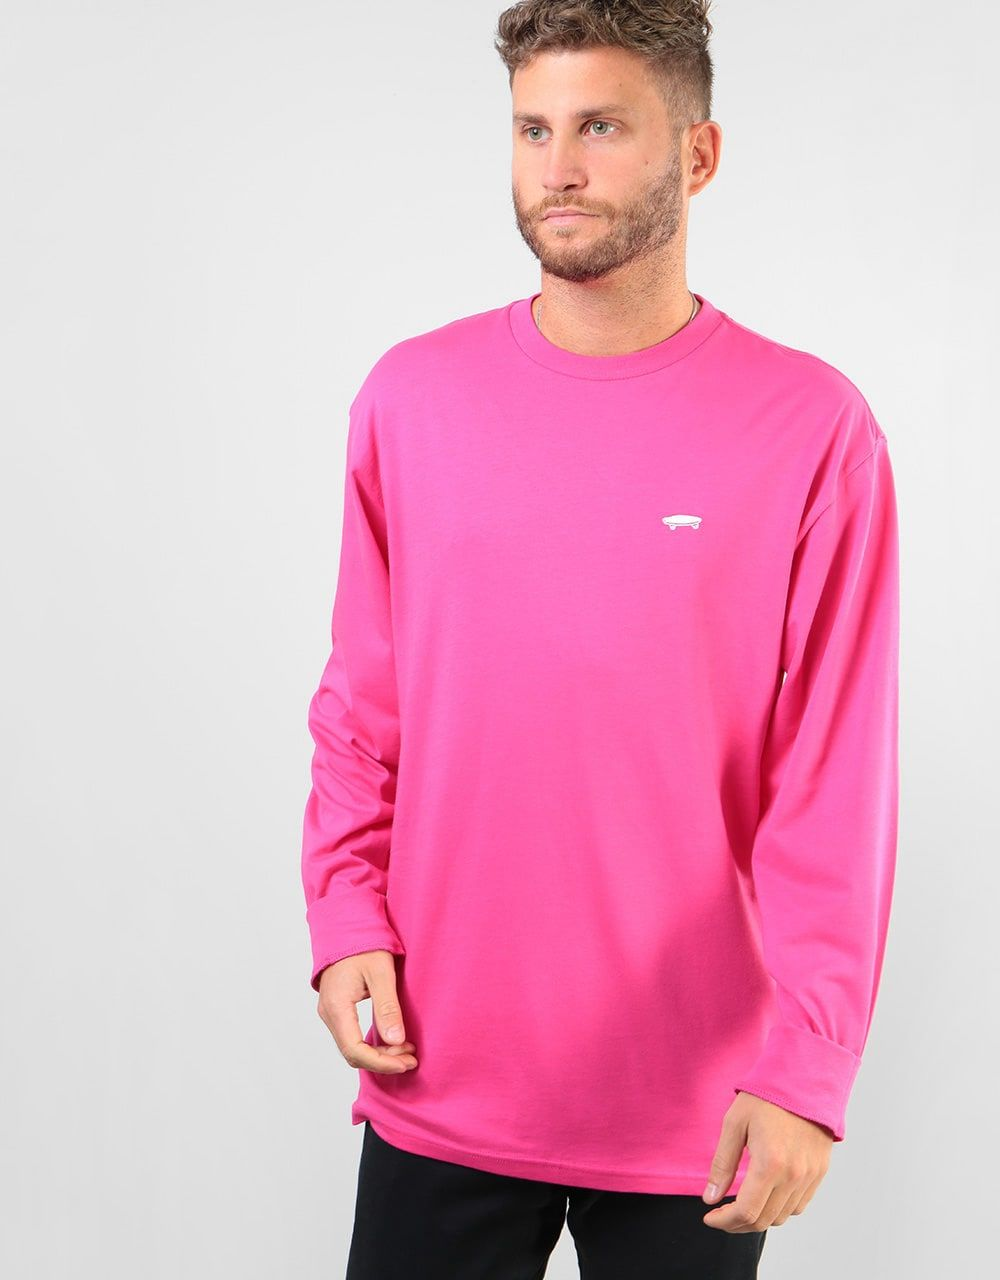 2706350b6 Vans Skate L/S T-Shirt - Magenta   Flash Sale   Route One   Stuff i ...